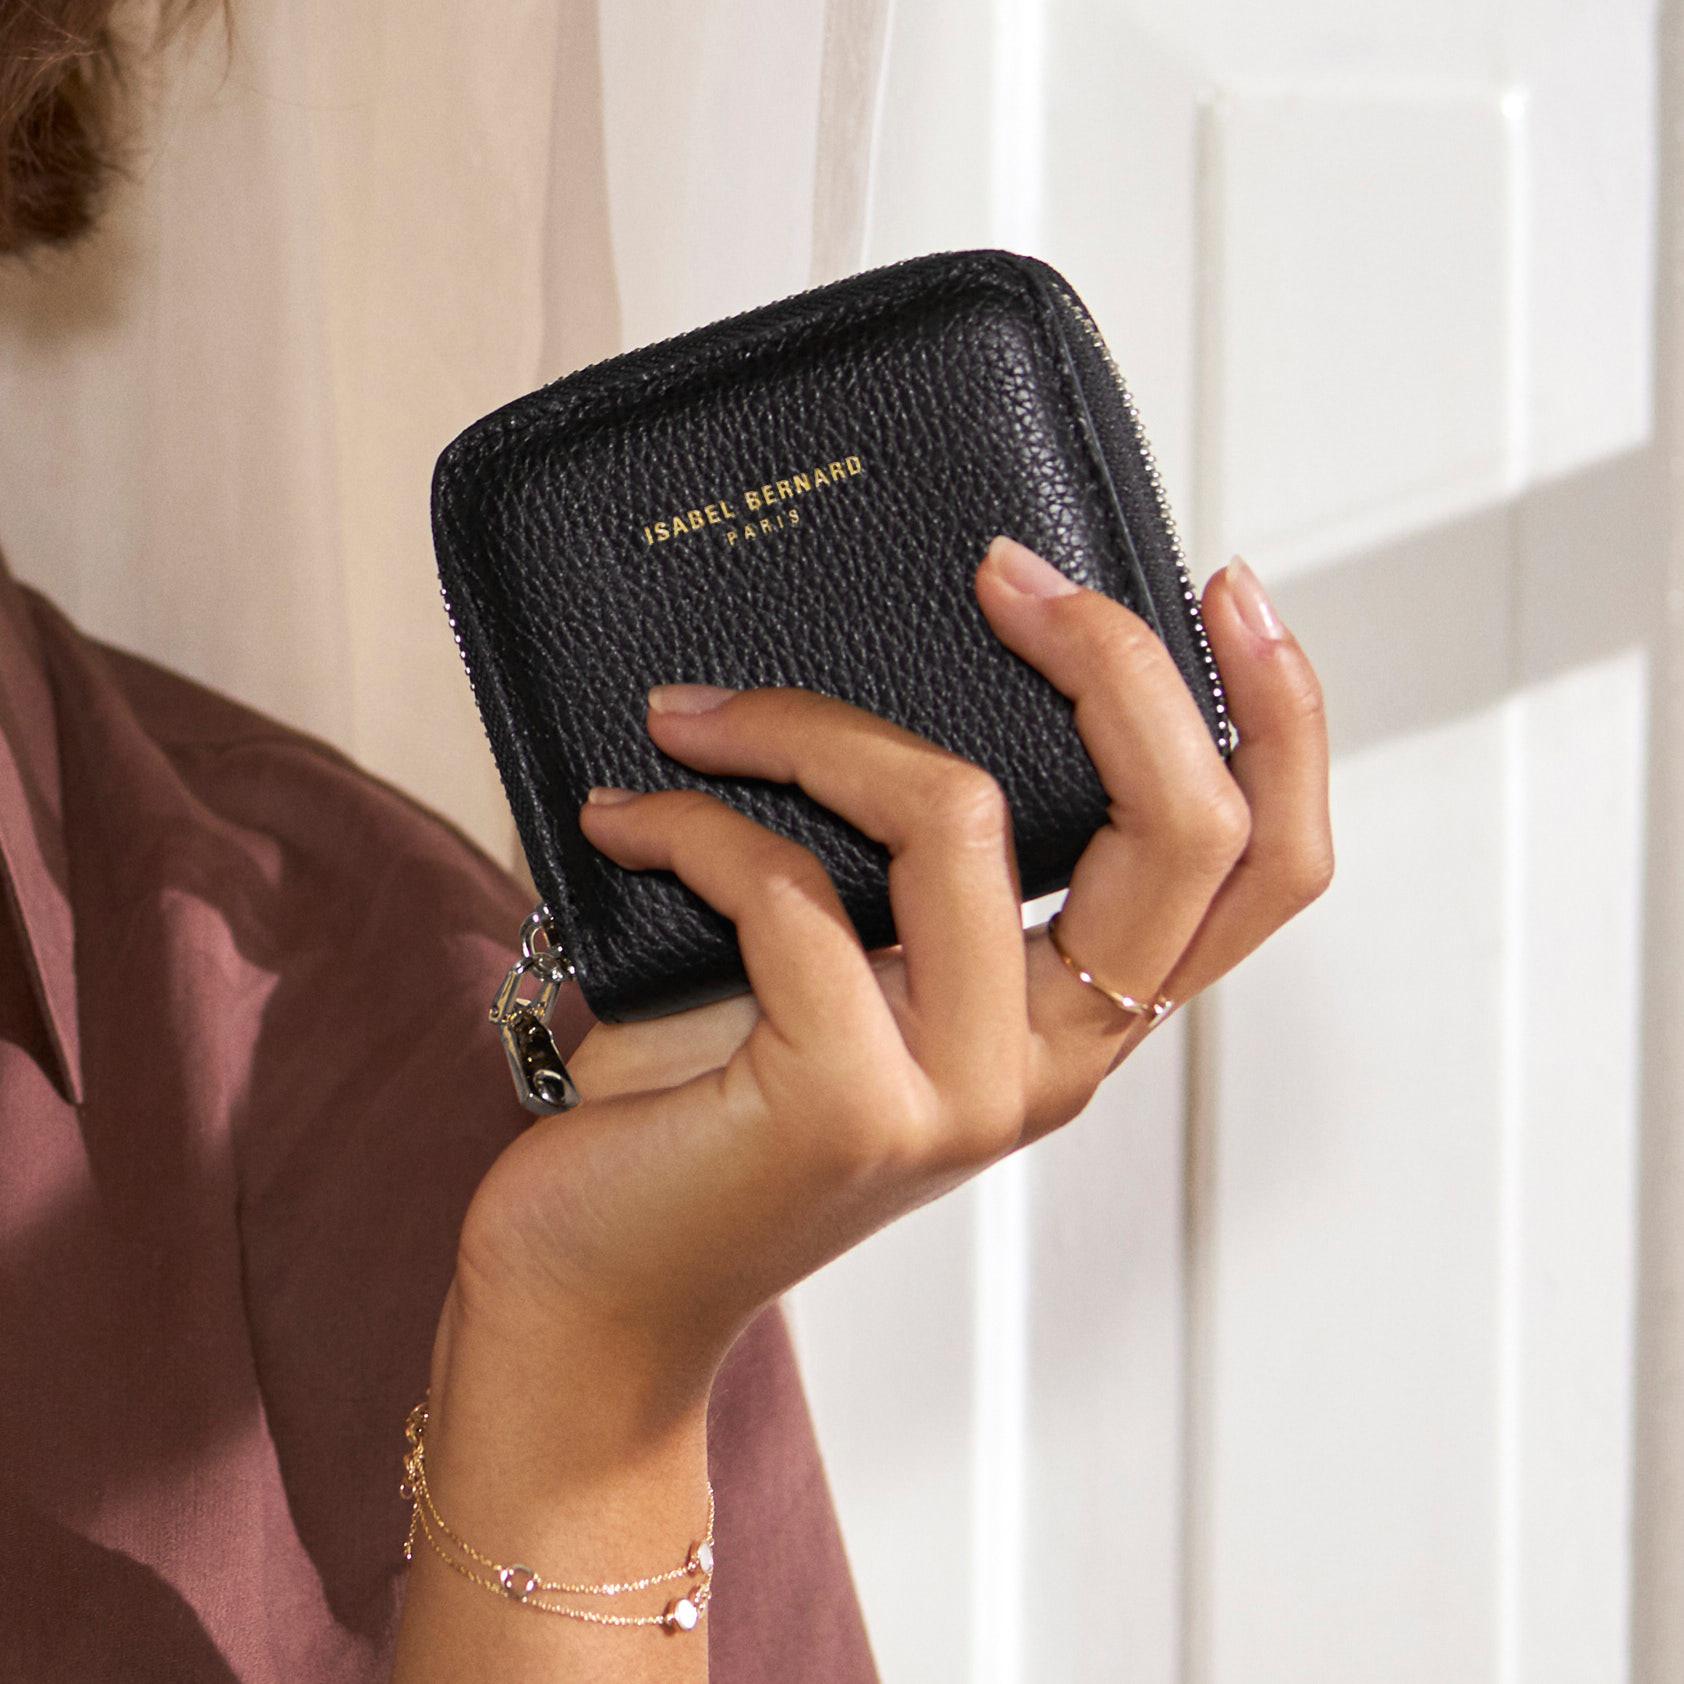 Isabel Bernard Honoré Jules svart läderplånbok i kalvläder med blixtlås